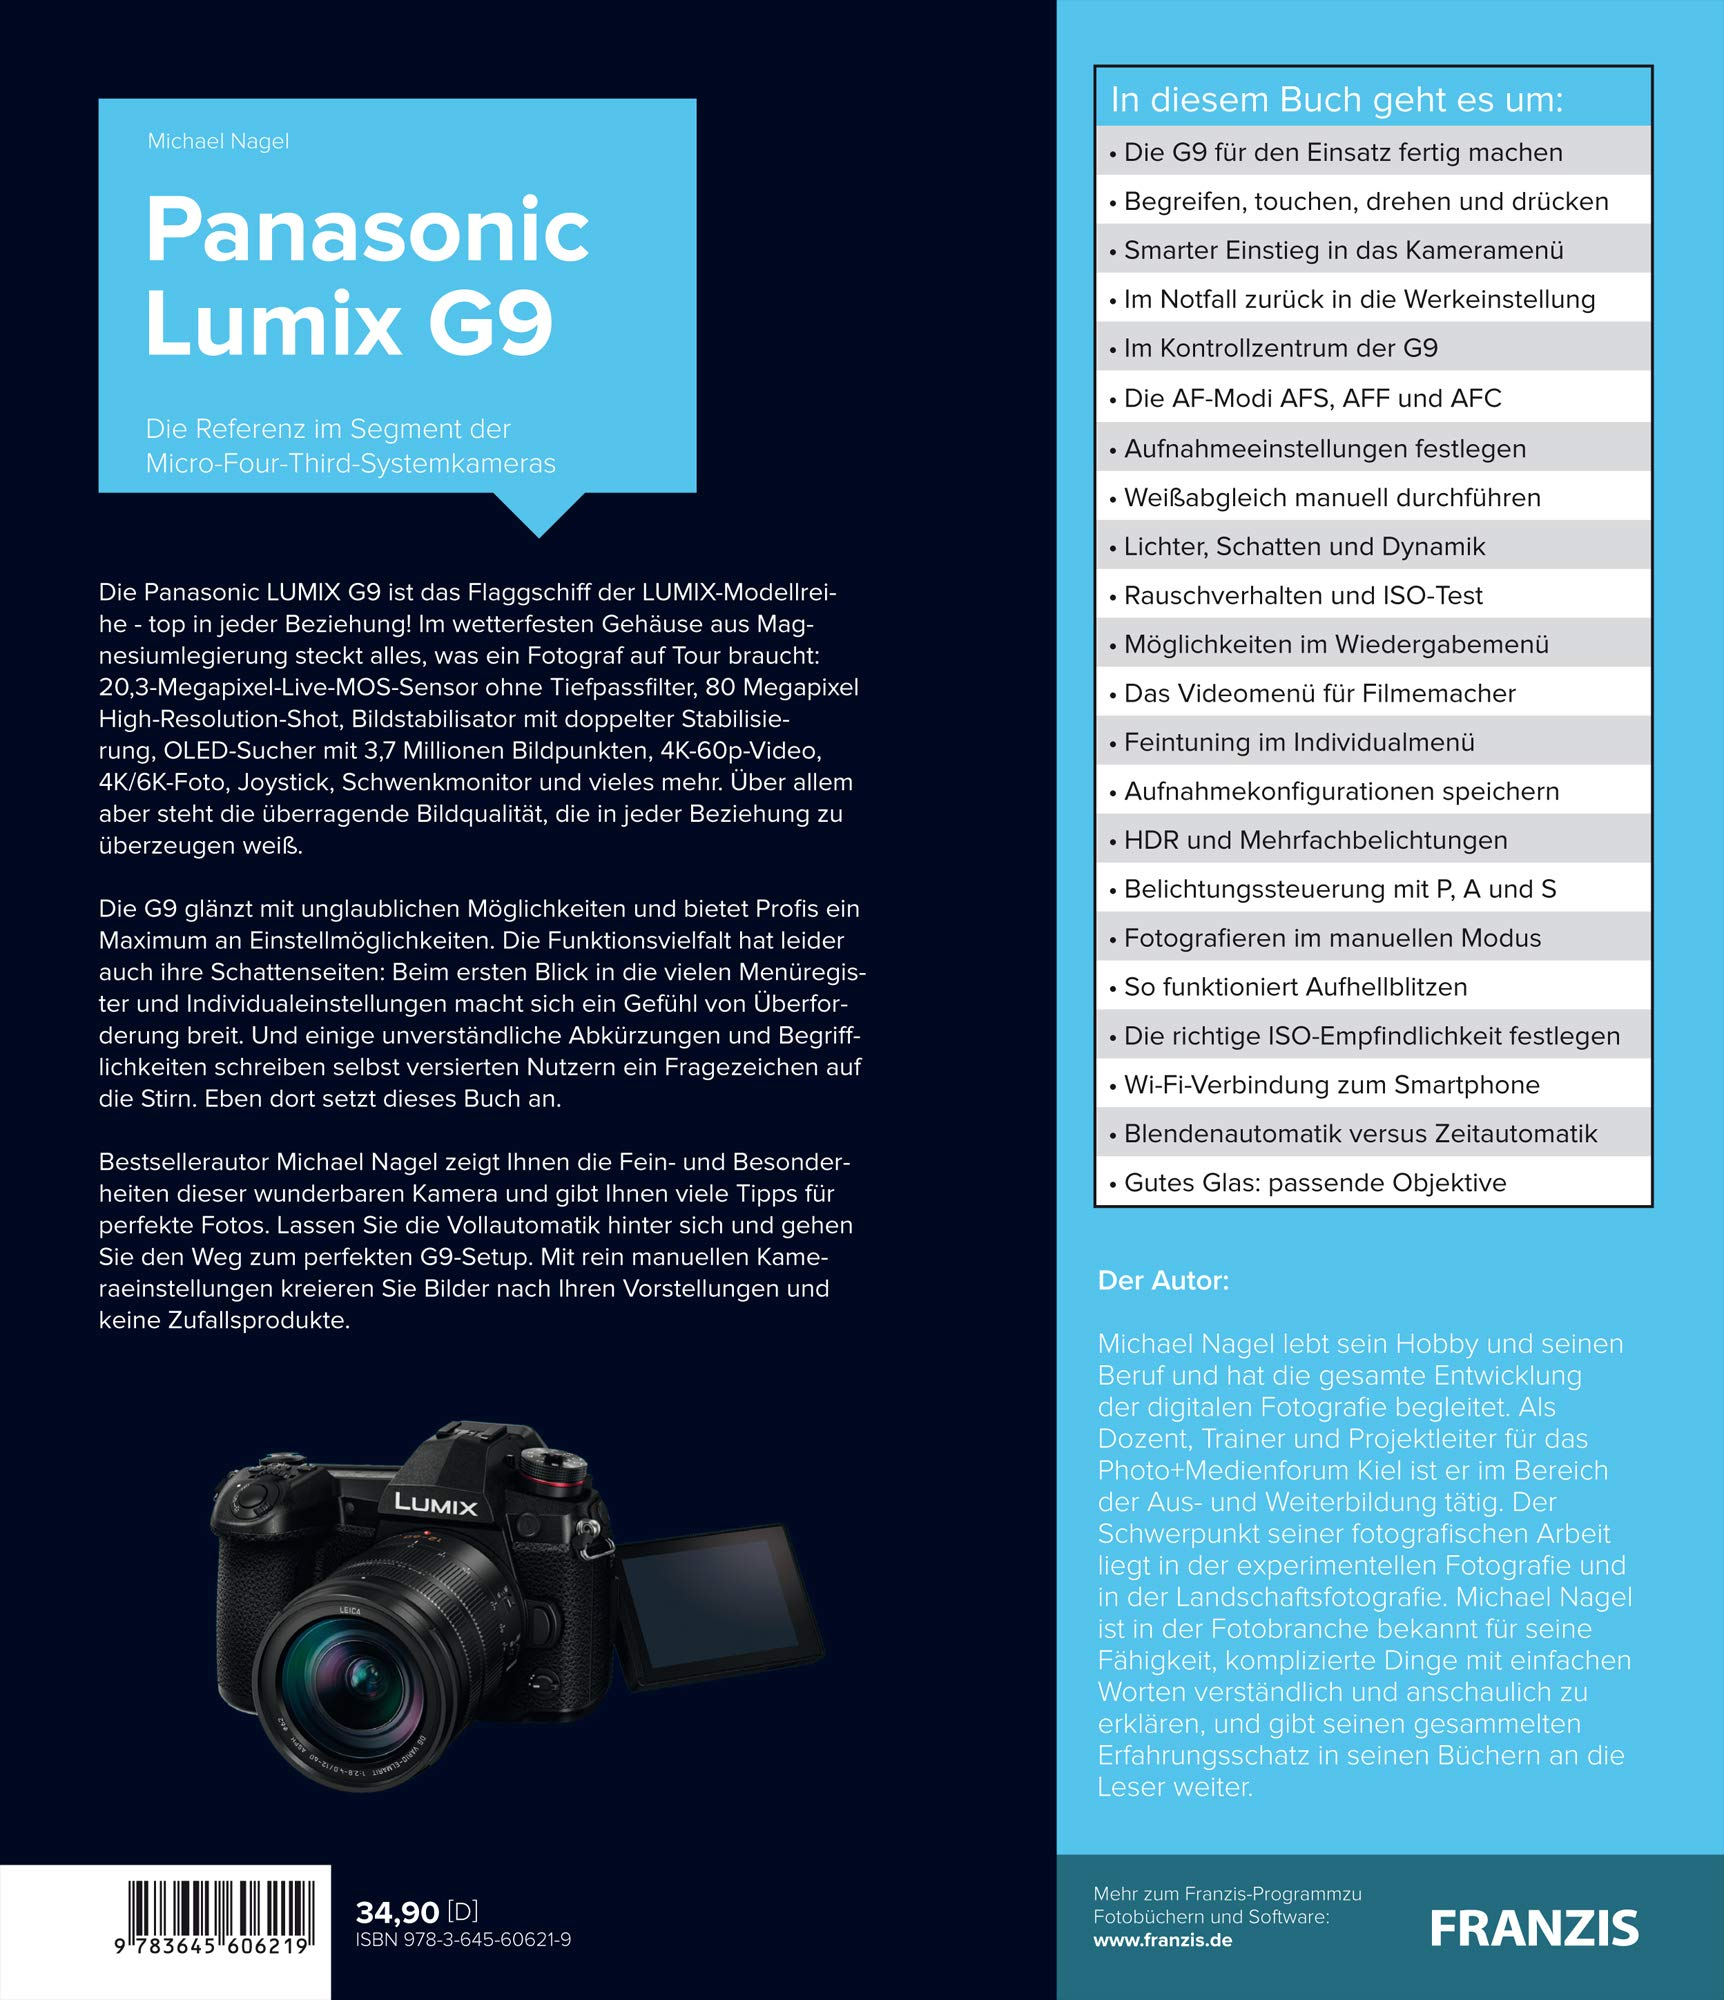 Kamerabuch Panasonic LUMIX G9: Amazon.es: Michael Nagel: Libros en ...